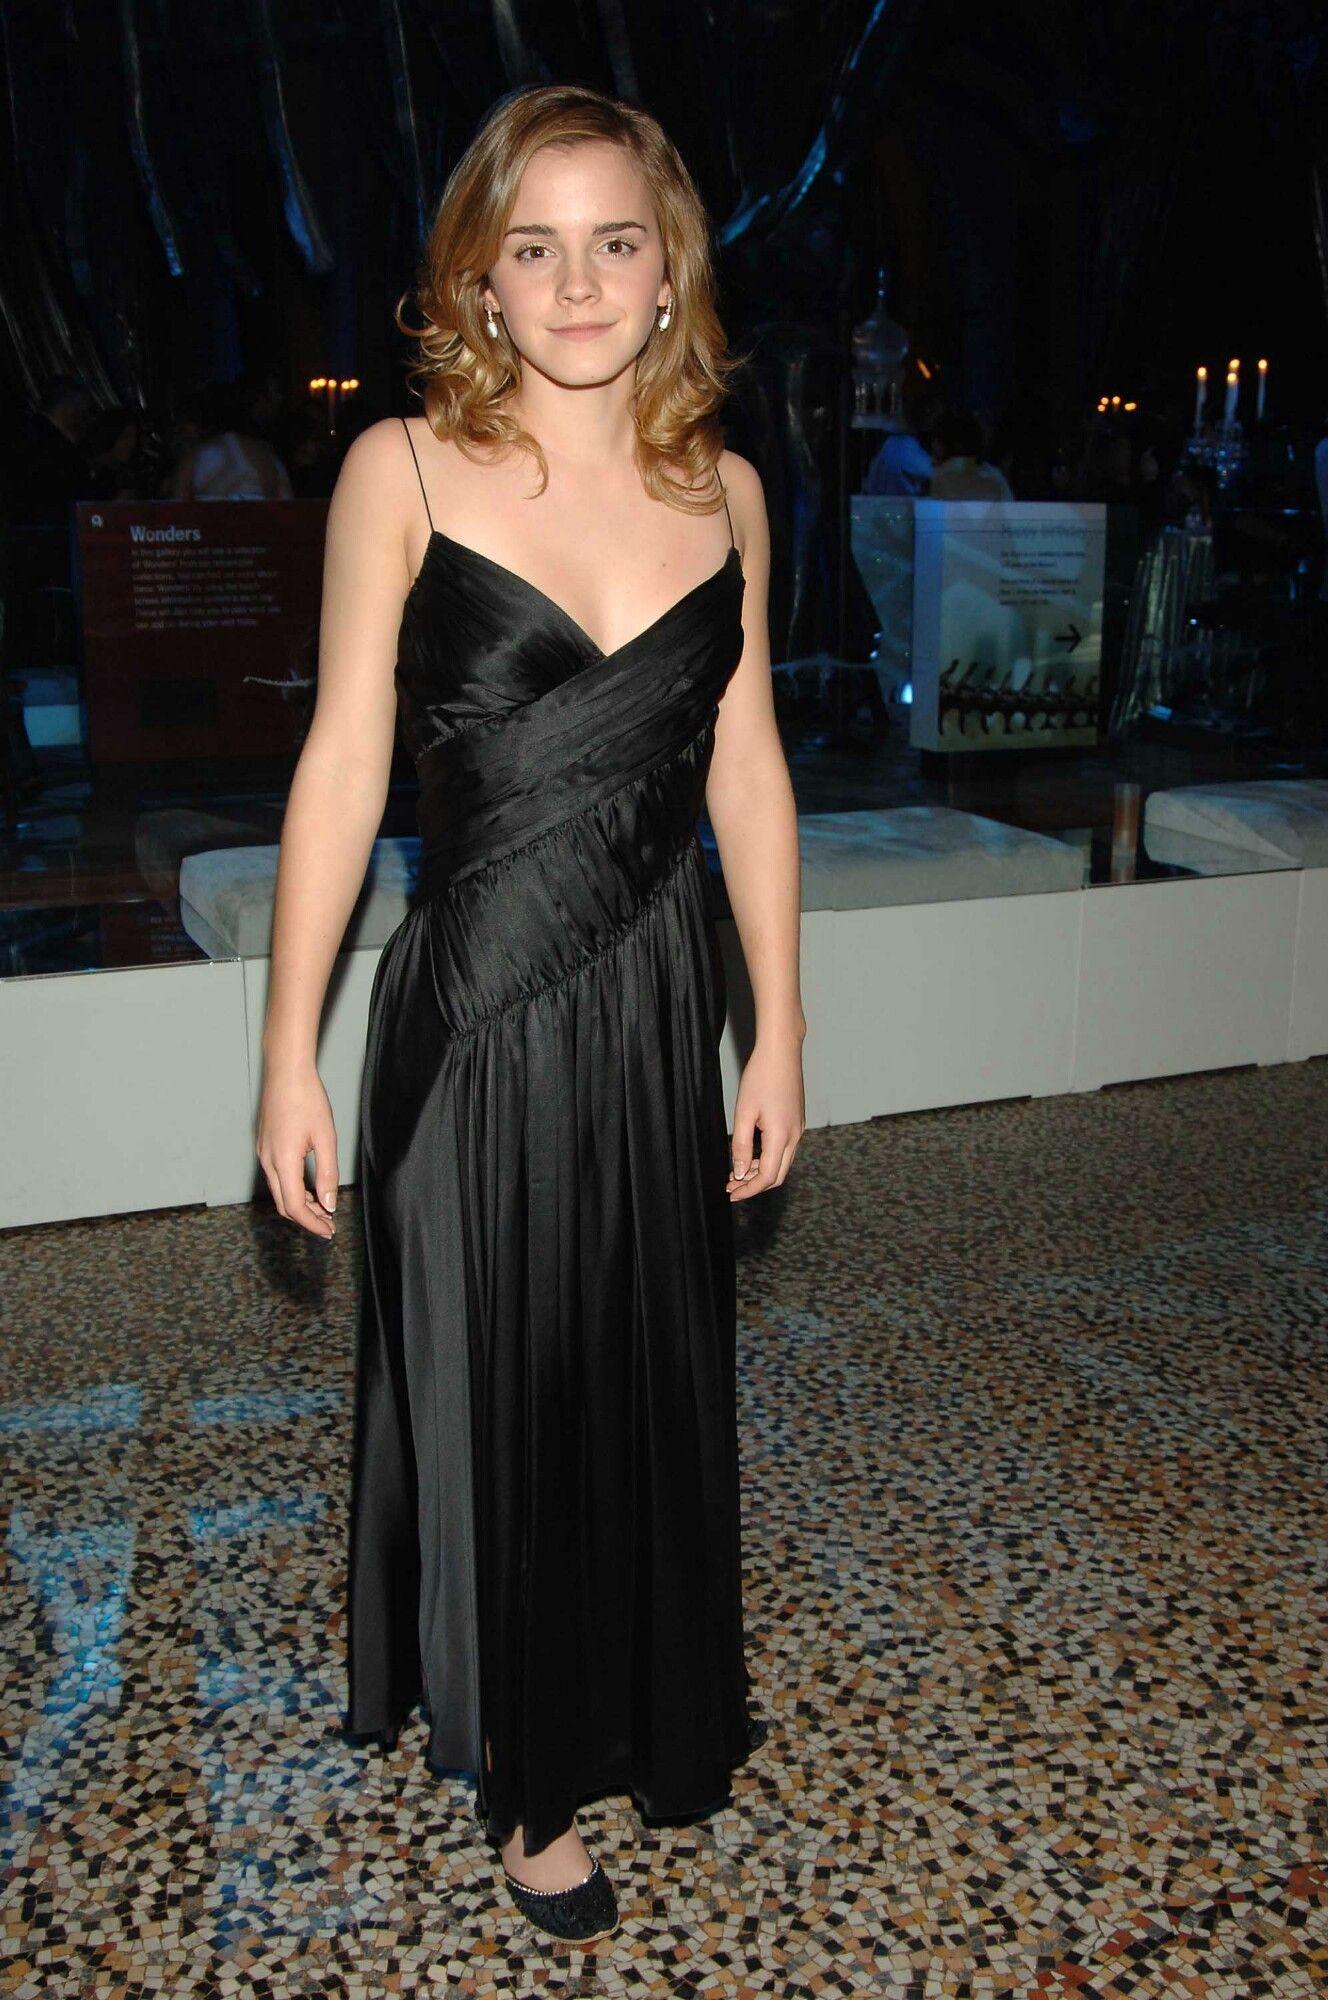 Harry Potter And The Goblet Of Fire Uk Premiere After Party Emmawatson Emma Watson Style Emma Watson Premiere